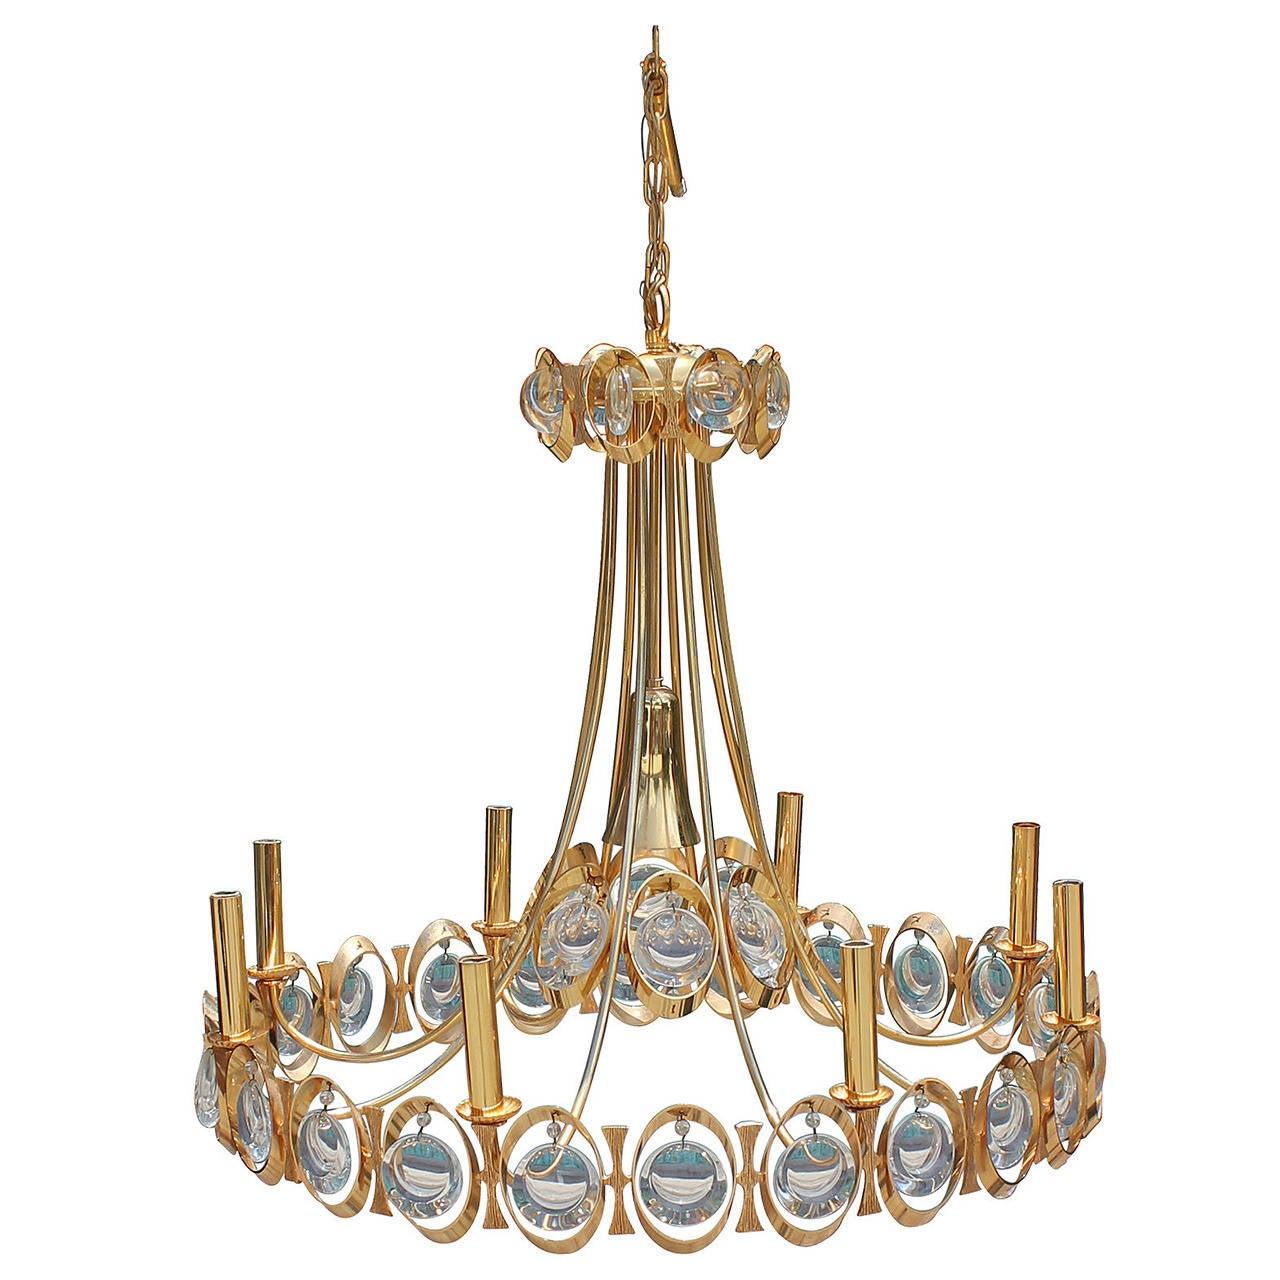 Stunning gilt brass hollywood regency chandelier by palwa at 1stdibs stunning gilt brass hollywood regency chandelier by palwa 1 mozeypictures Gallery